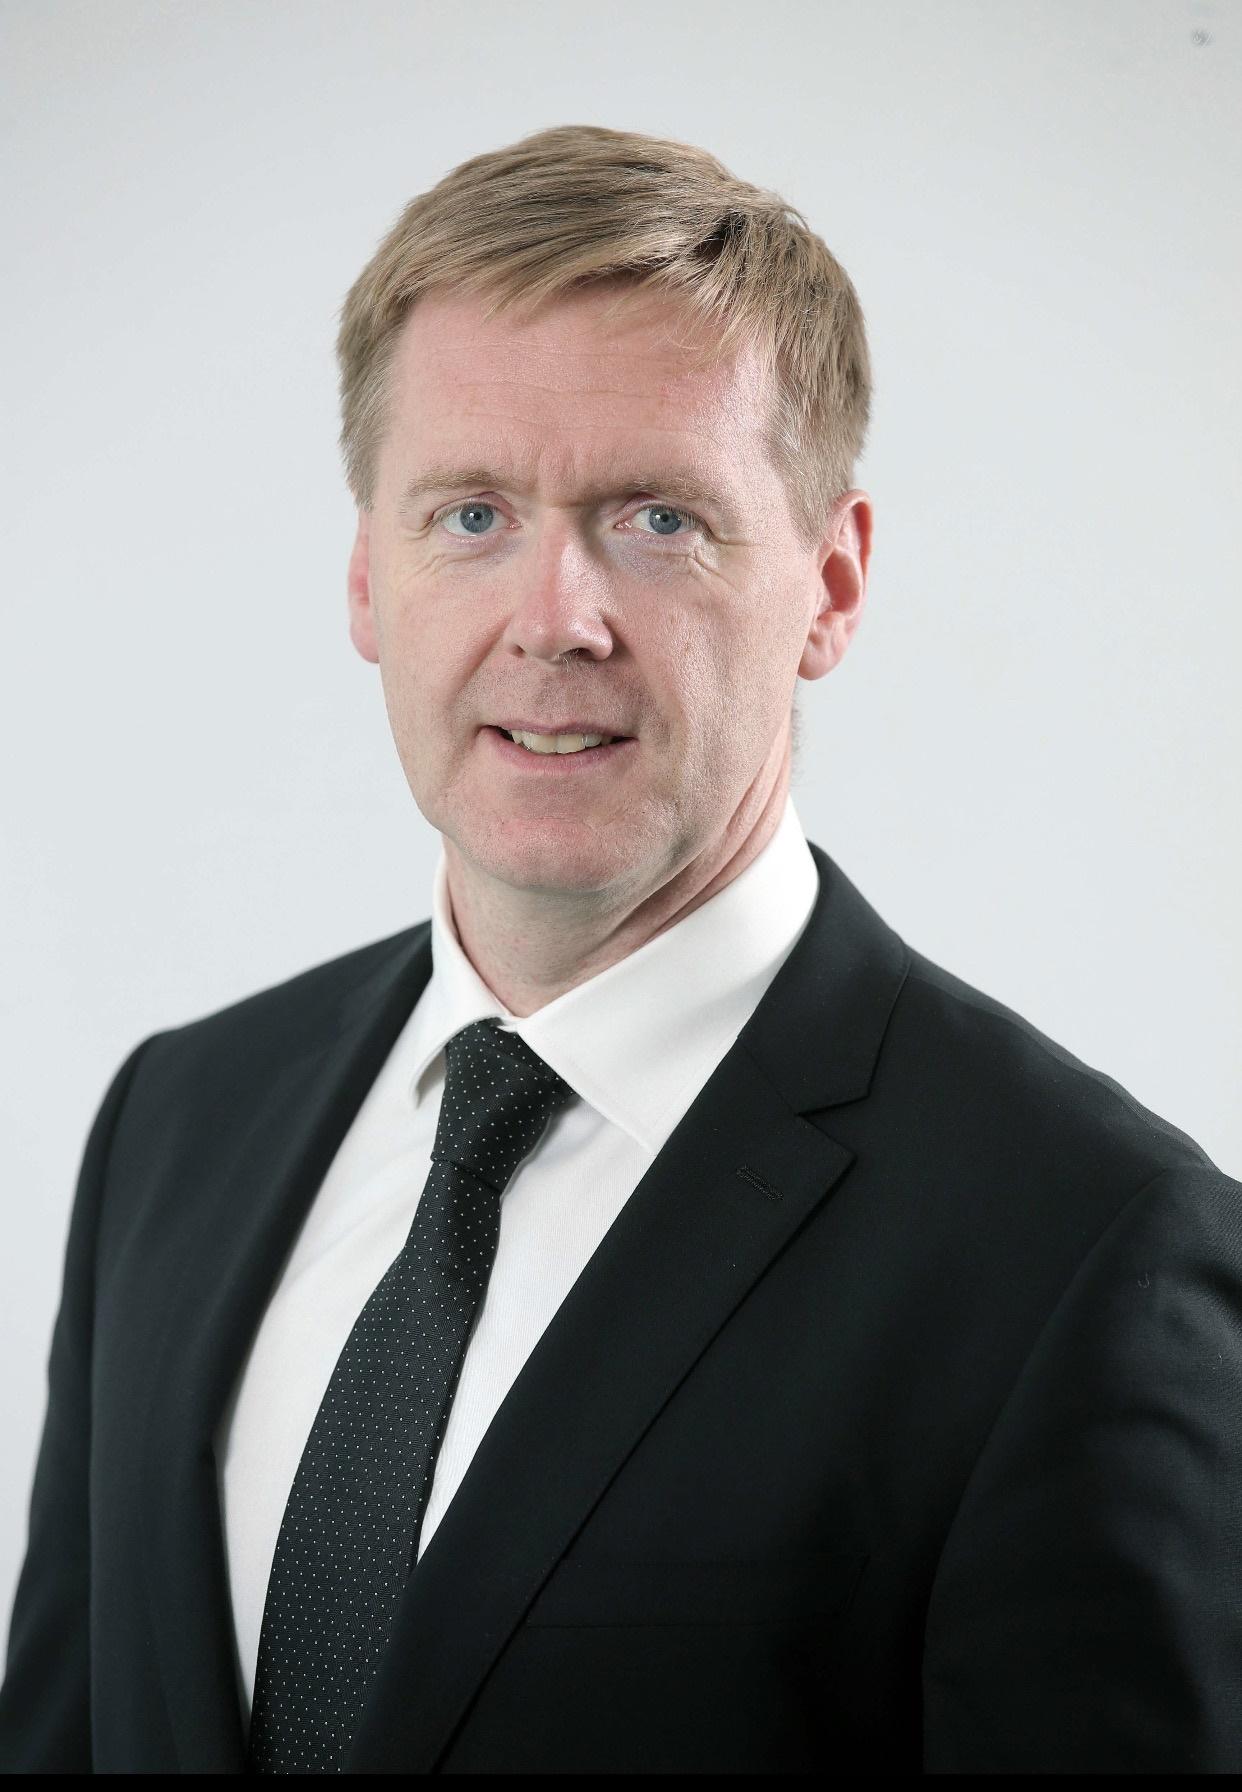 Mark Crimmins Ulster Bank SME survey - NI business news - Freelance Copywriter Paul Malone